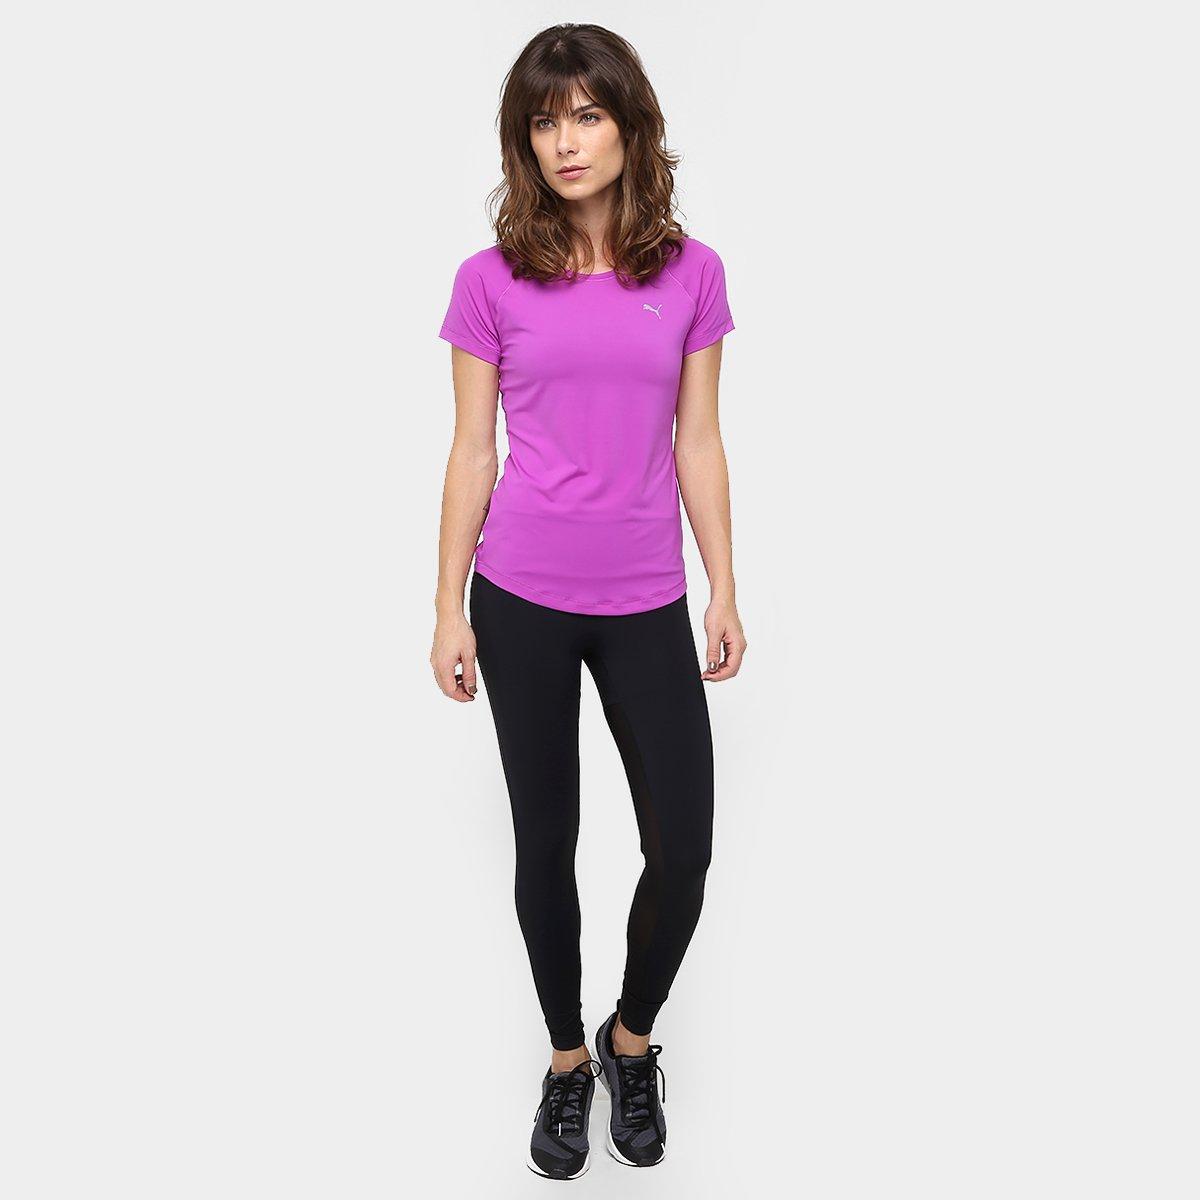 3faf65c439 Camiseta Puma Wt Essential Tee Feminina - Compre Agora